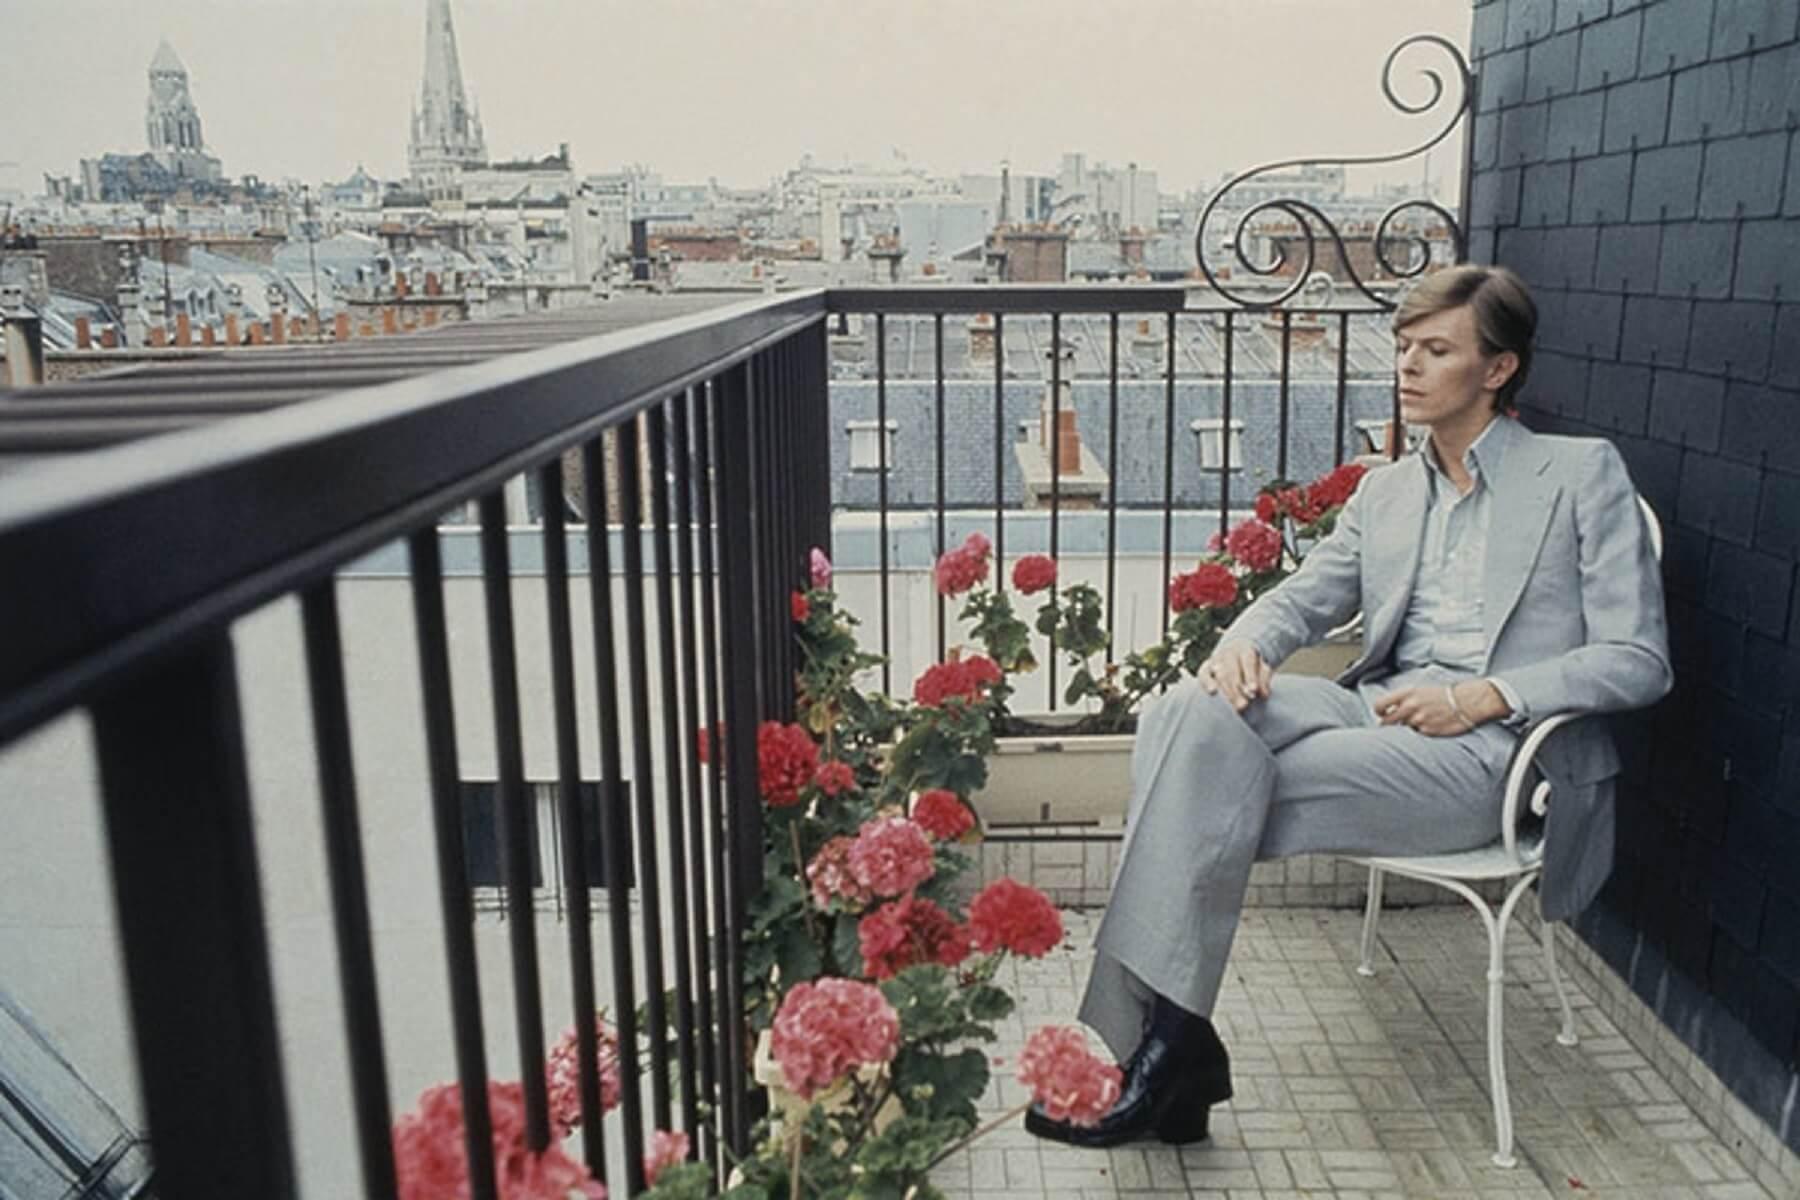 David-Bowie-in-Paris-1977